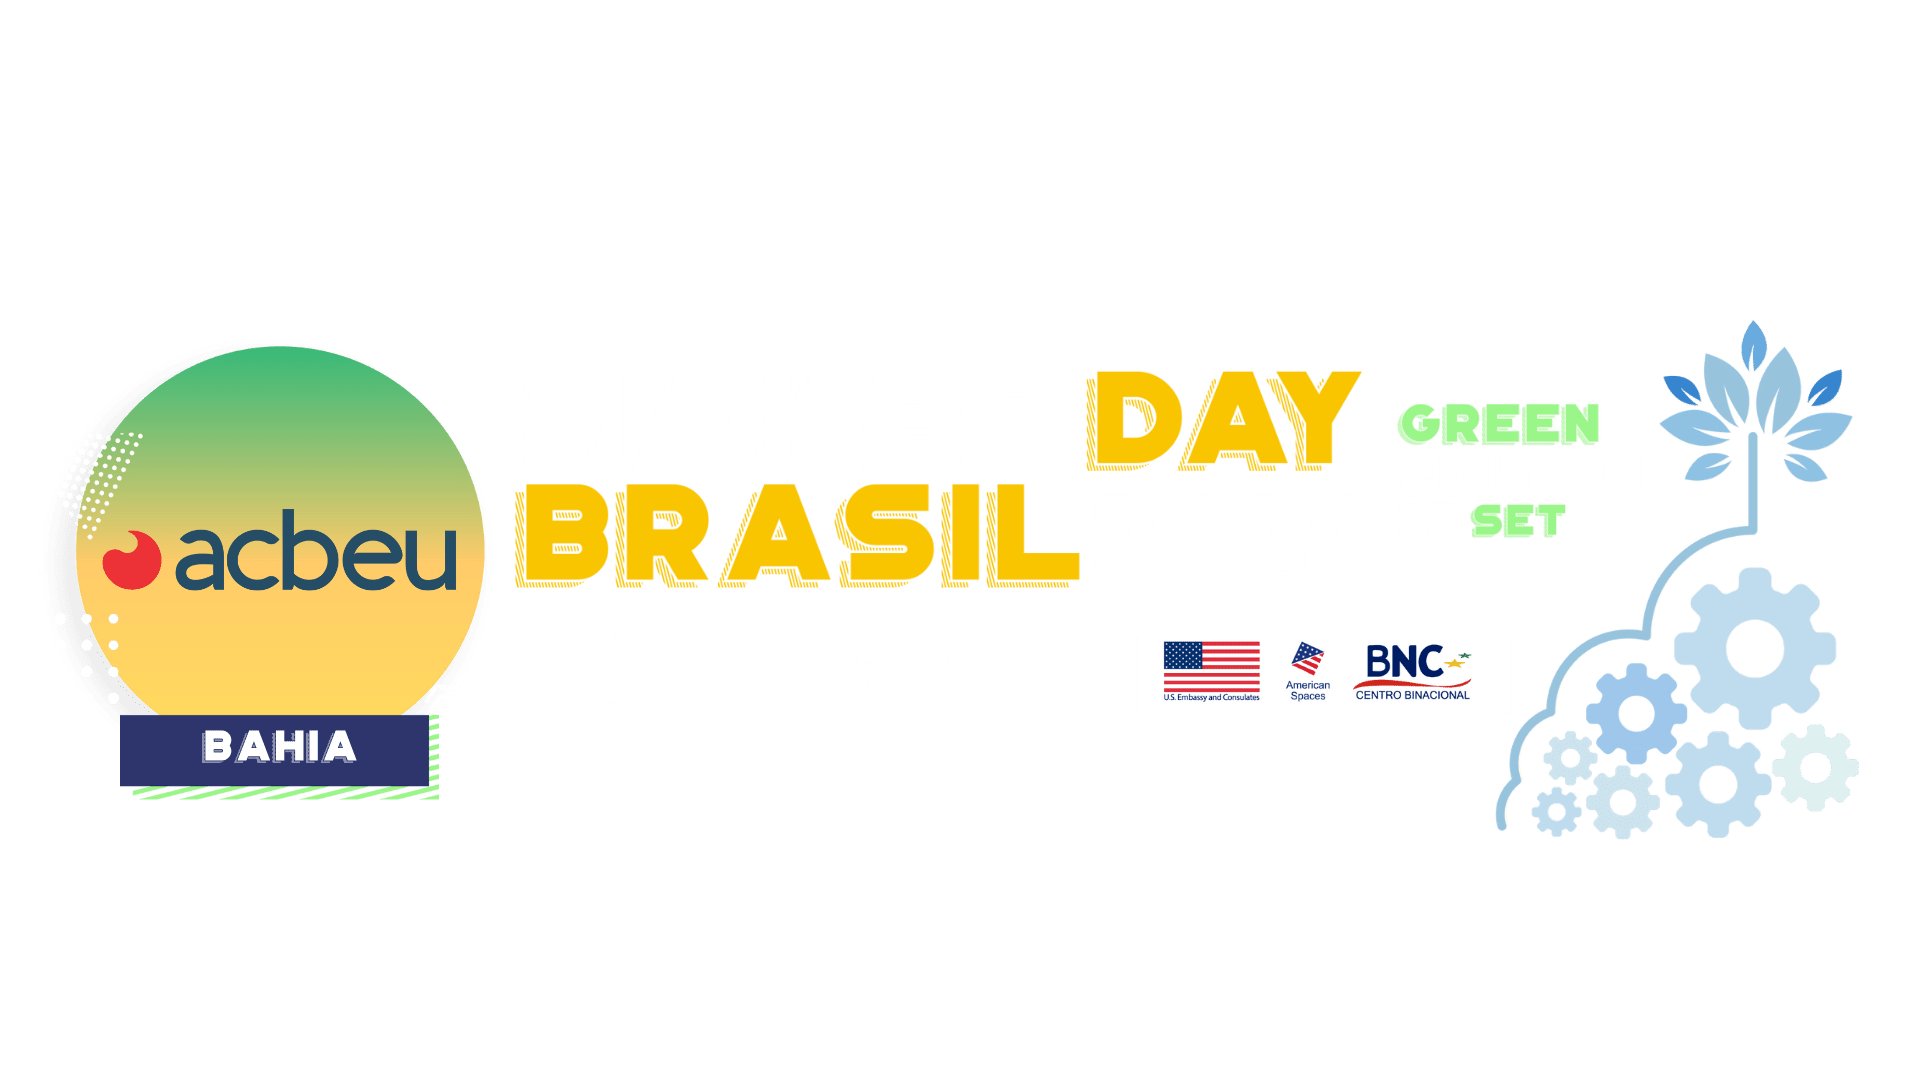 Maker Day Brasil Cover (1)